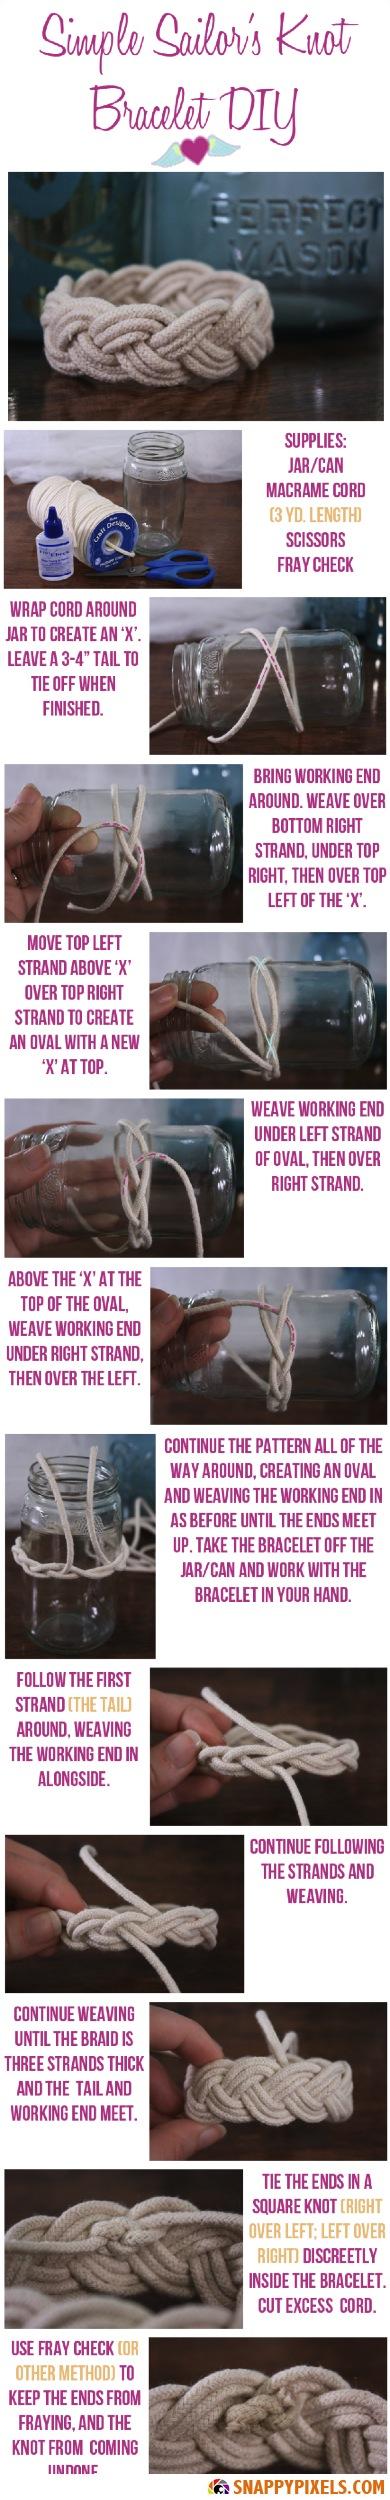 DIY Sailor's Knot Bracelet Instructions